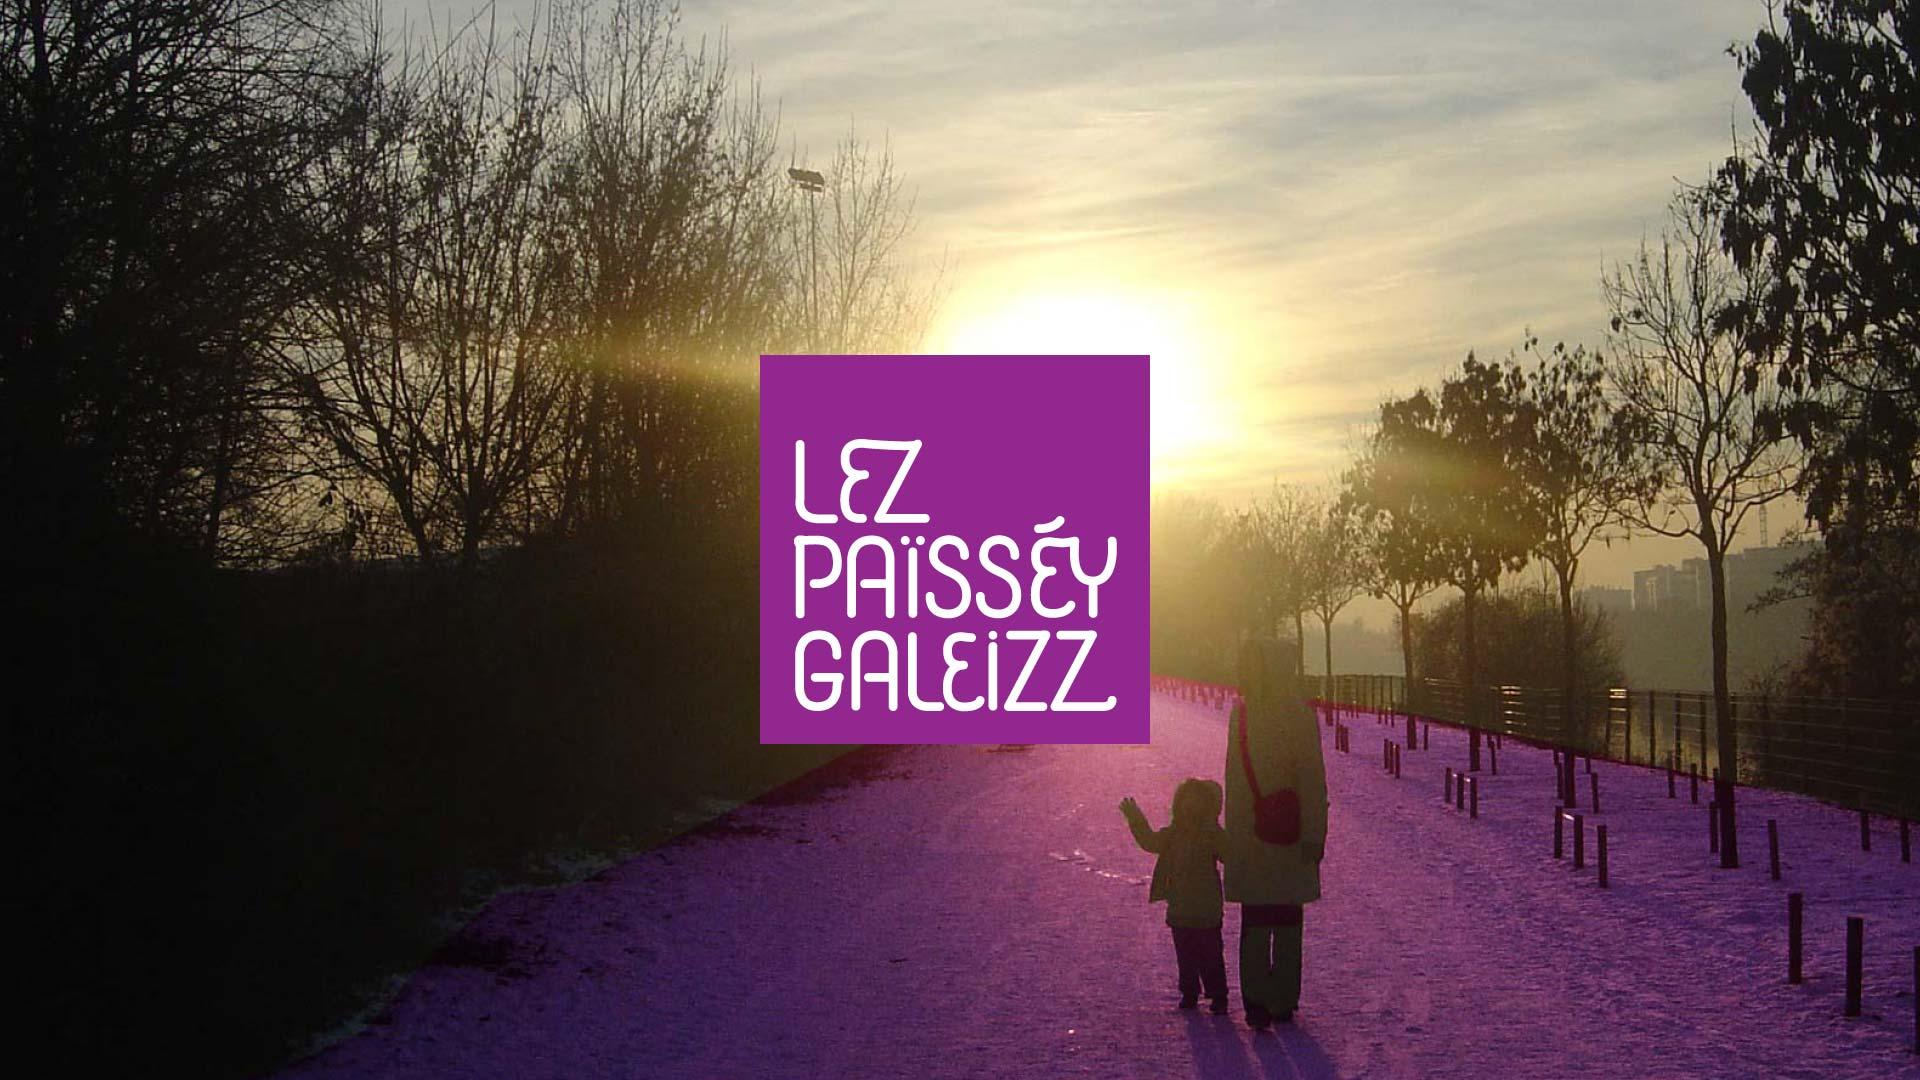 paissey